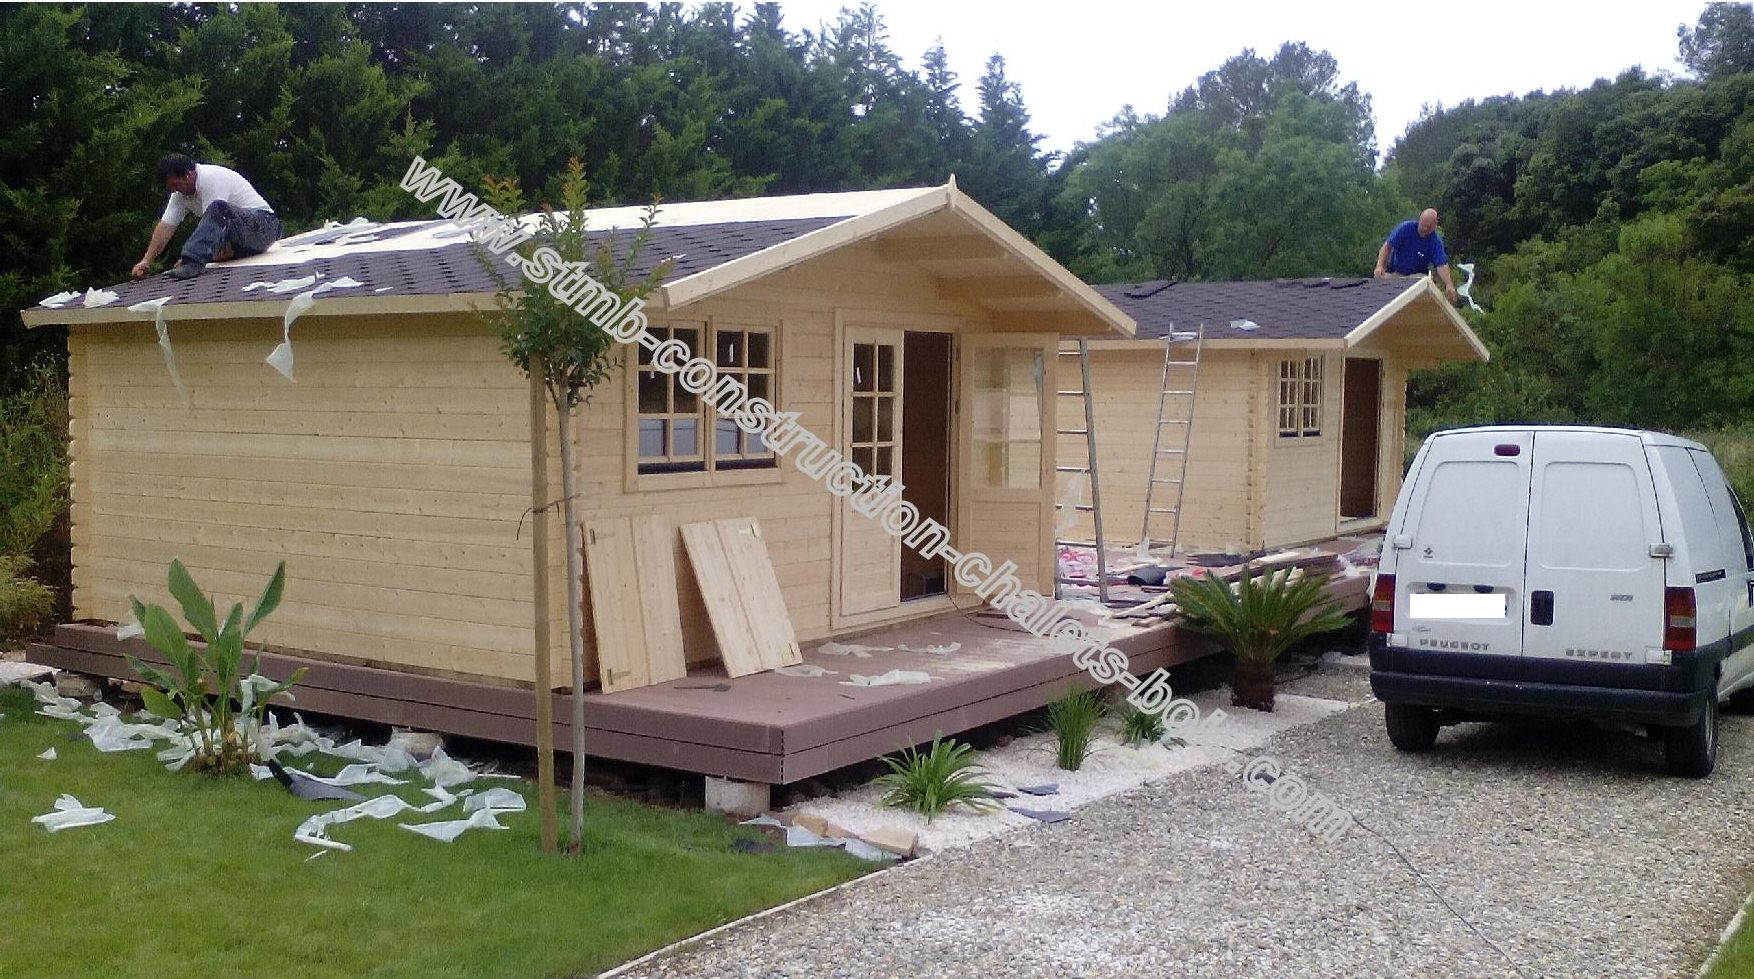 cchalet de jardin pas cher stmb construction chalets. Black Bedroom Furniture Sets. Home Design Ideas